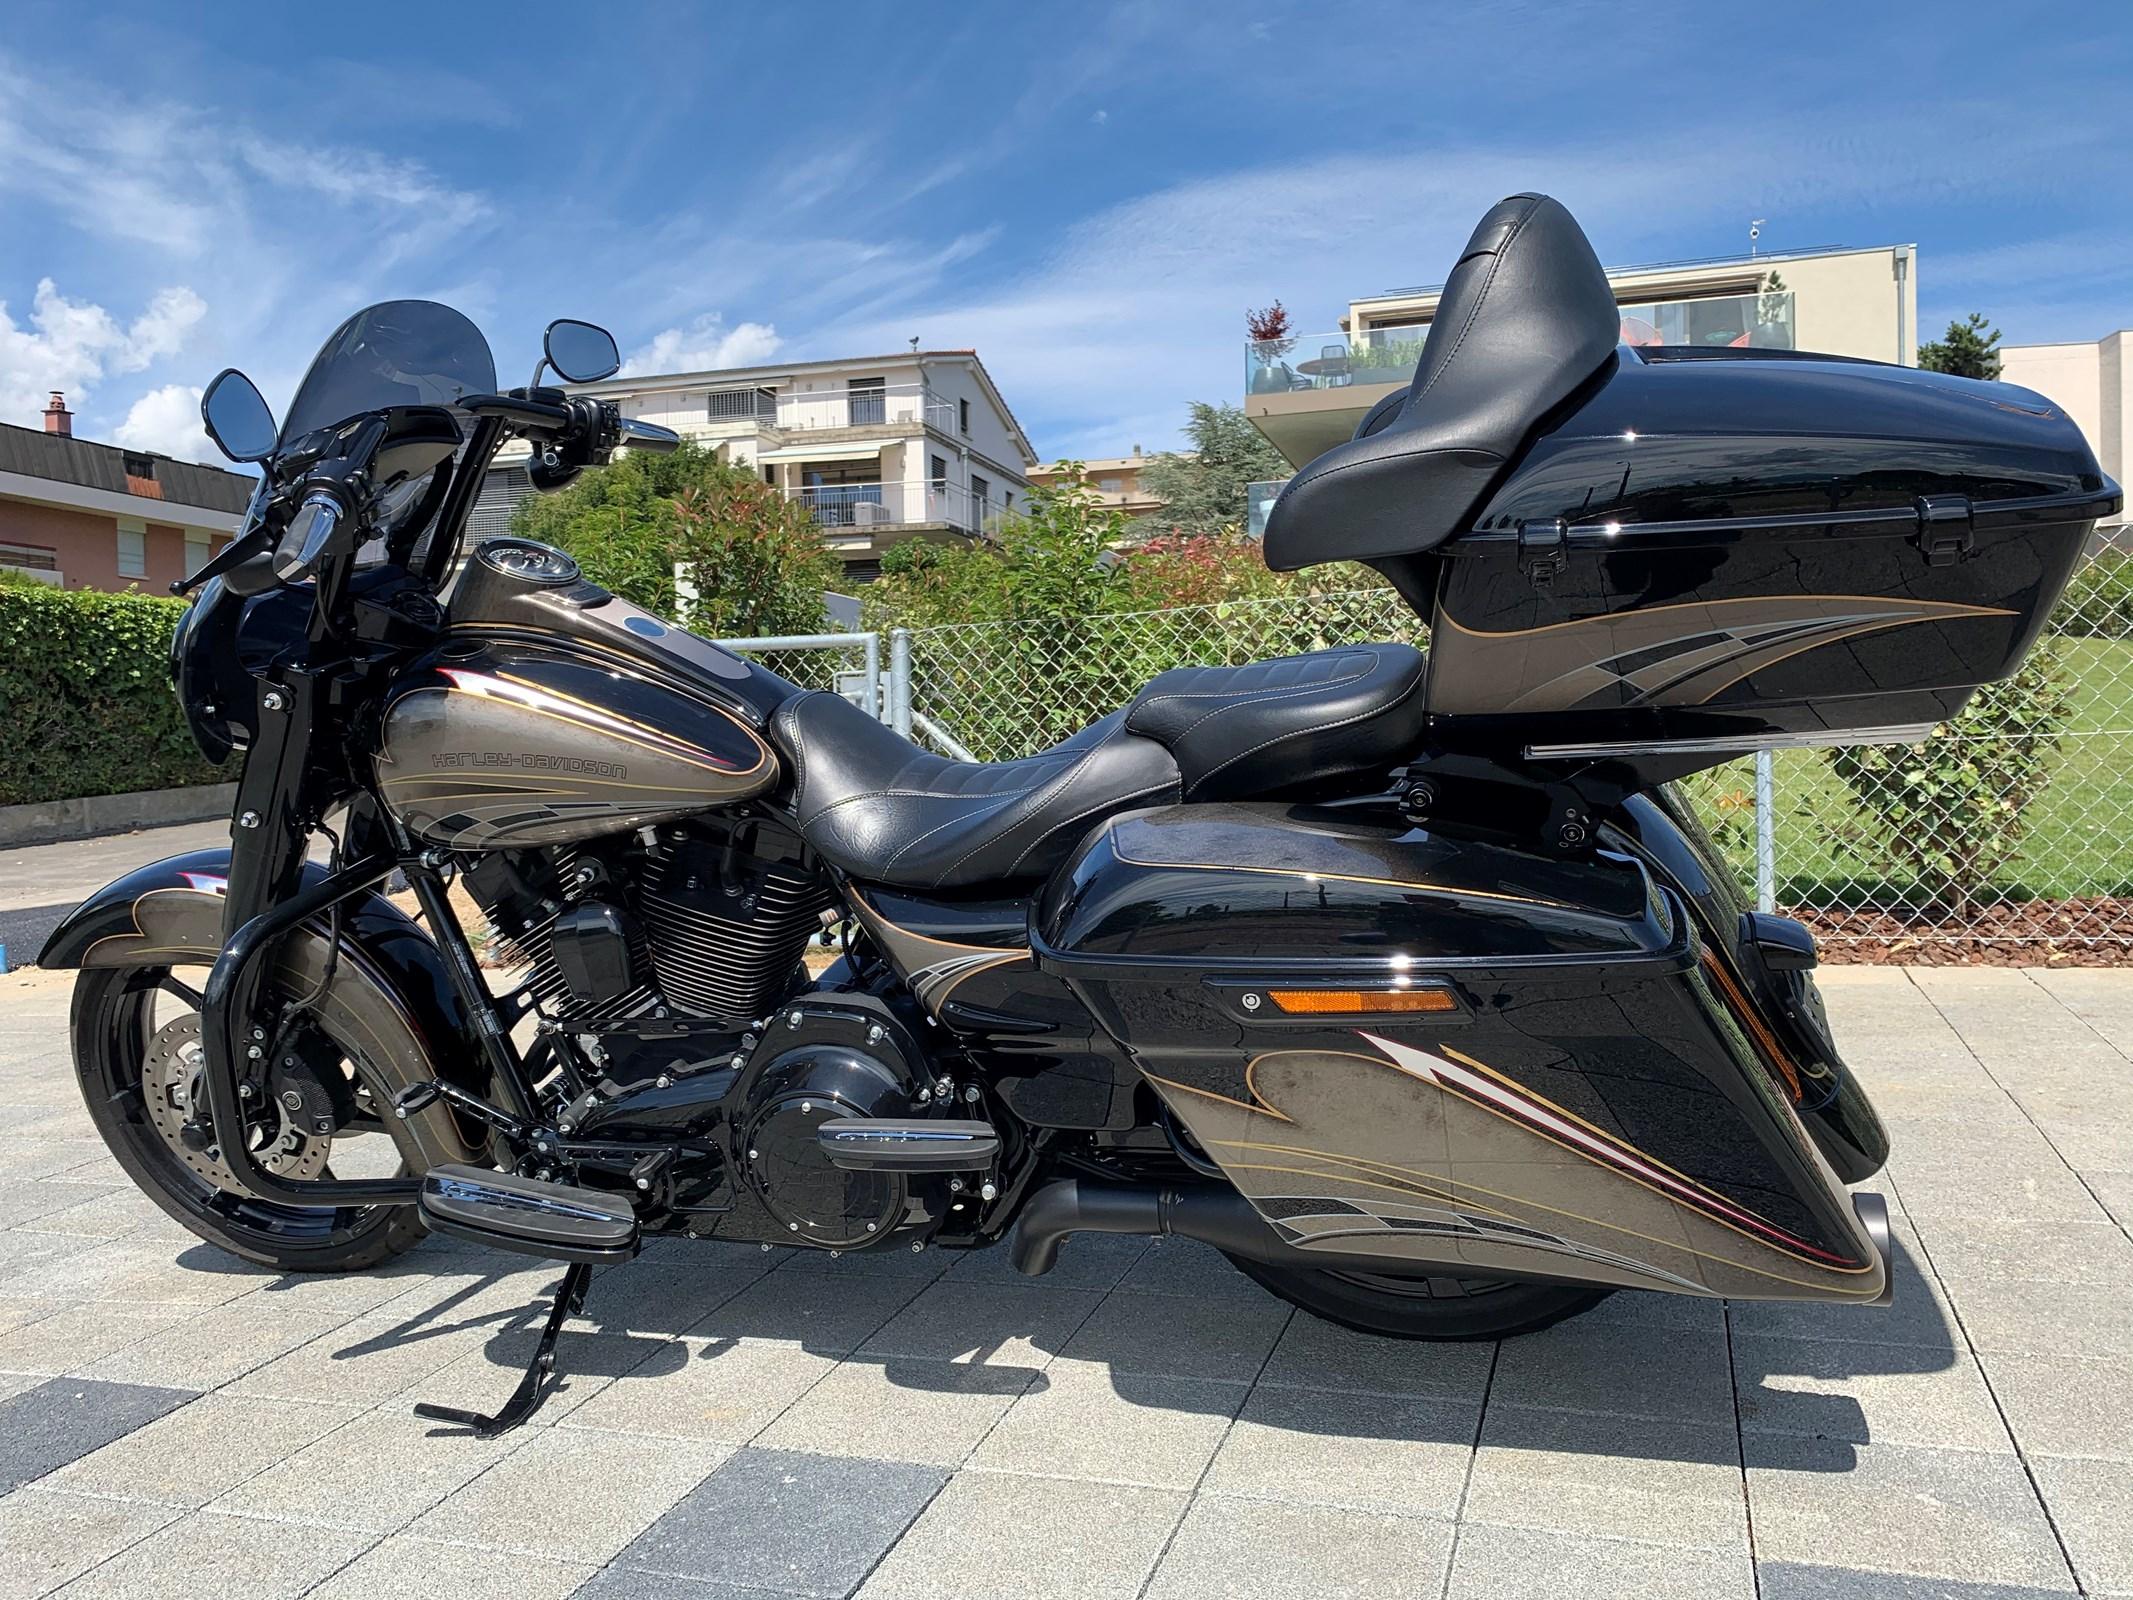 Harley-Davidson FLHRSE 1800 Road King CVO ABS